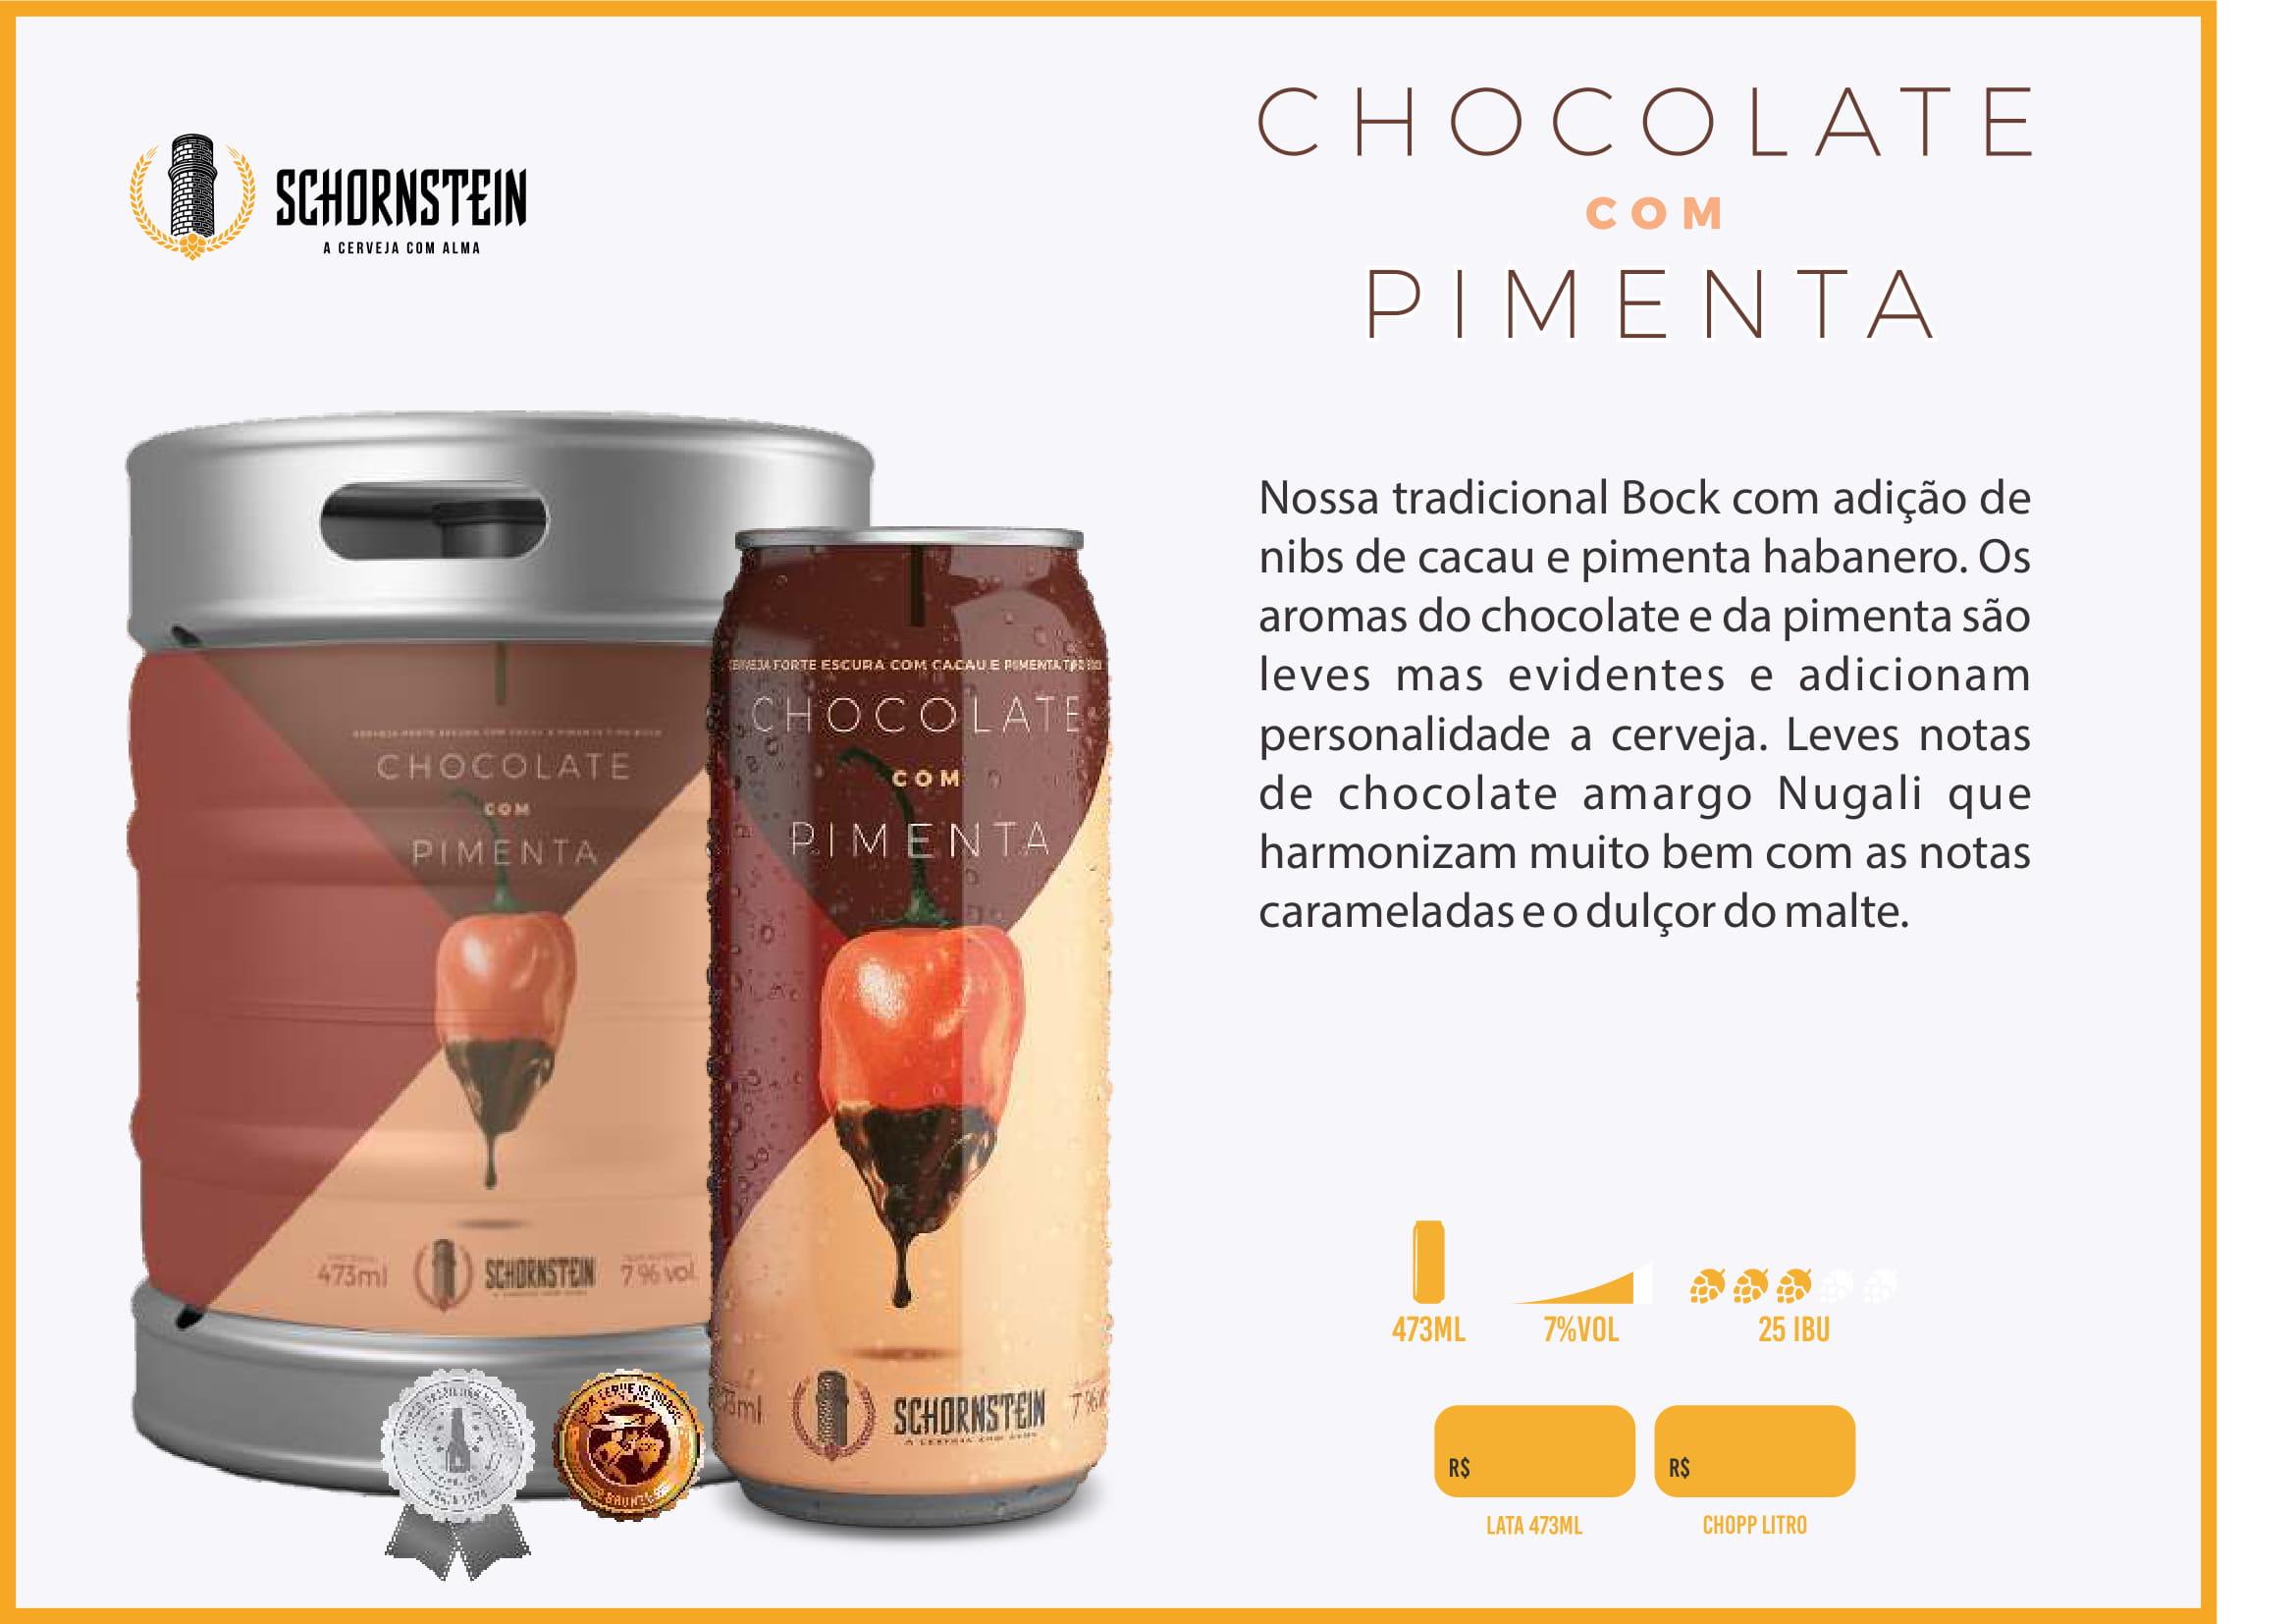 Schornstein Chocolate com pimenta